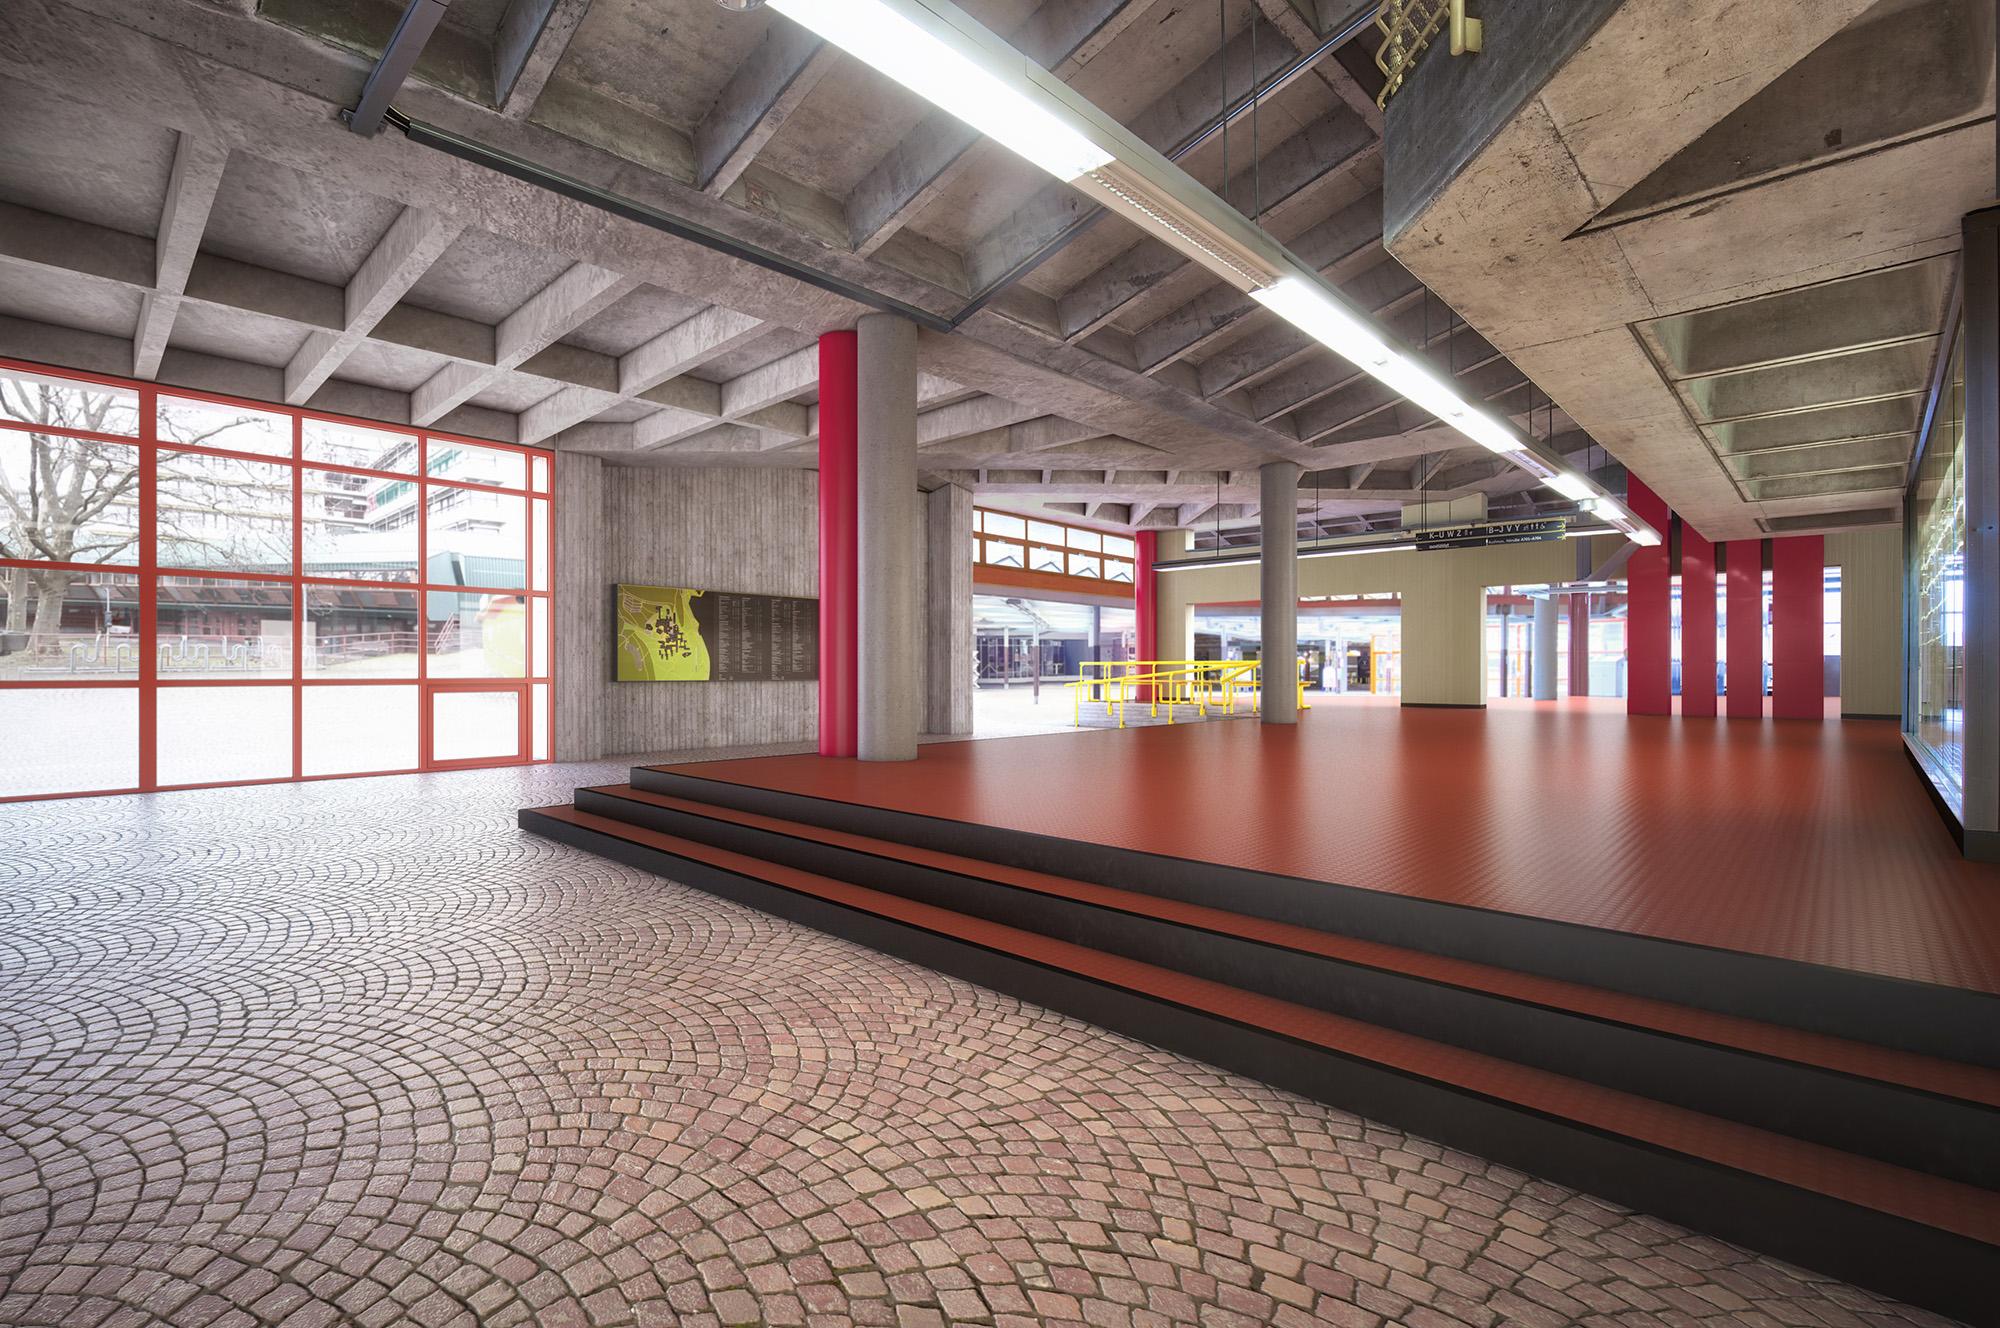 Anjana Perera Visualisierung -  Universität Konstanz - frm Architekten, Konstanz